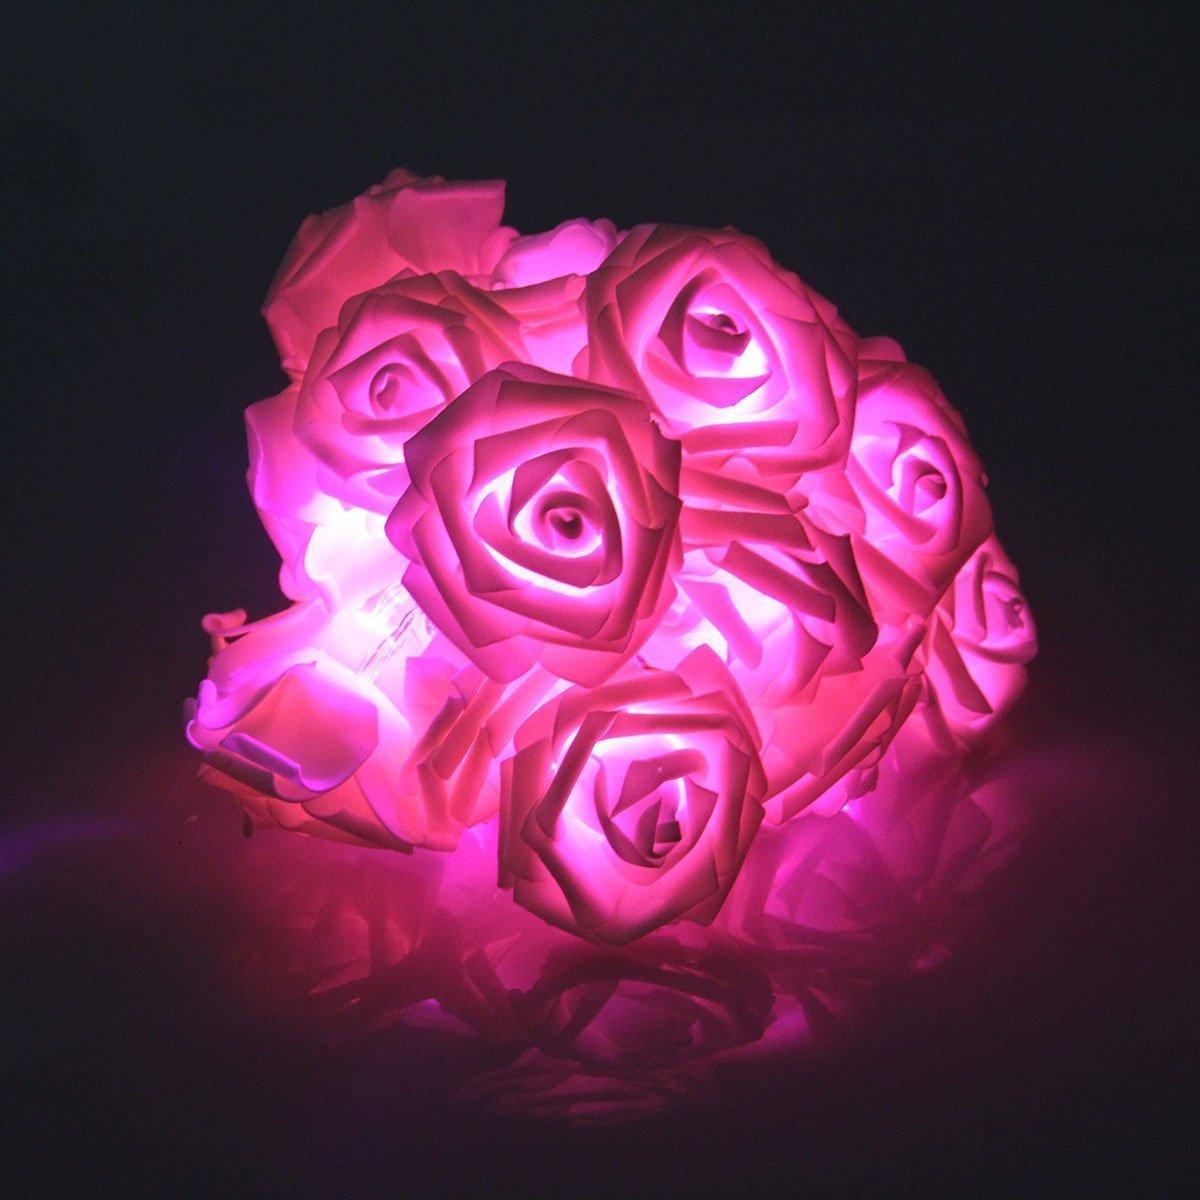 Pink Wedding Decorations: Amazon.co.uk